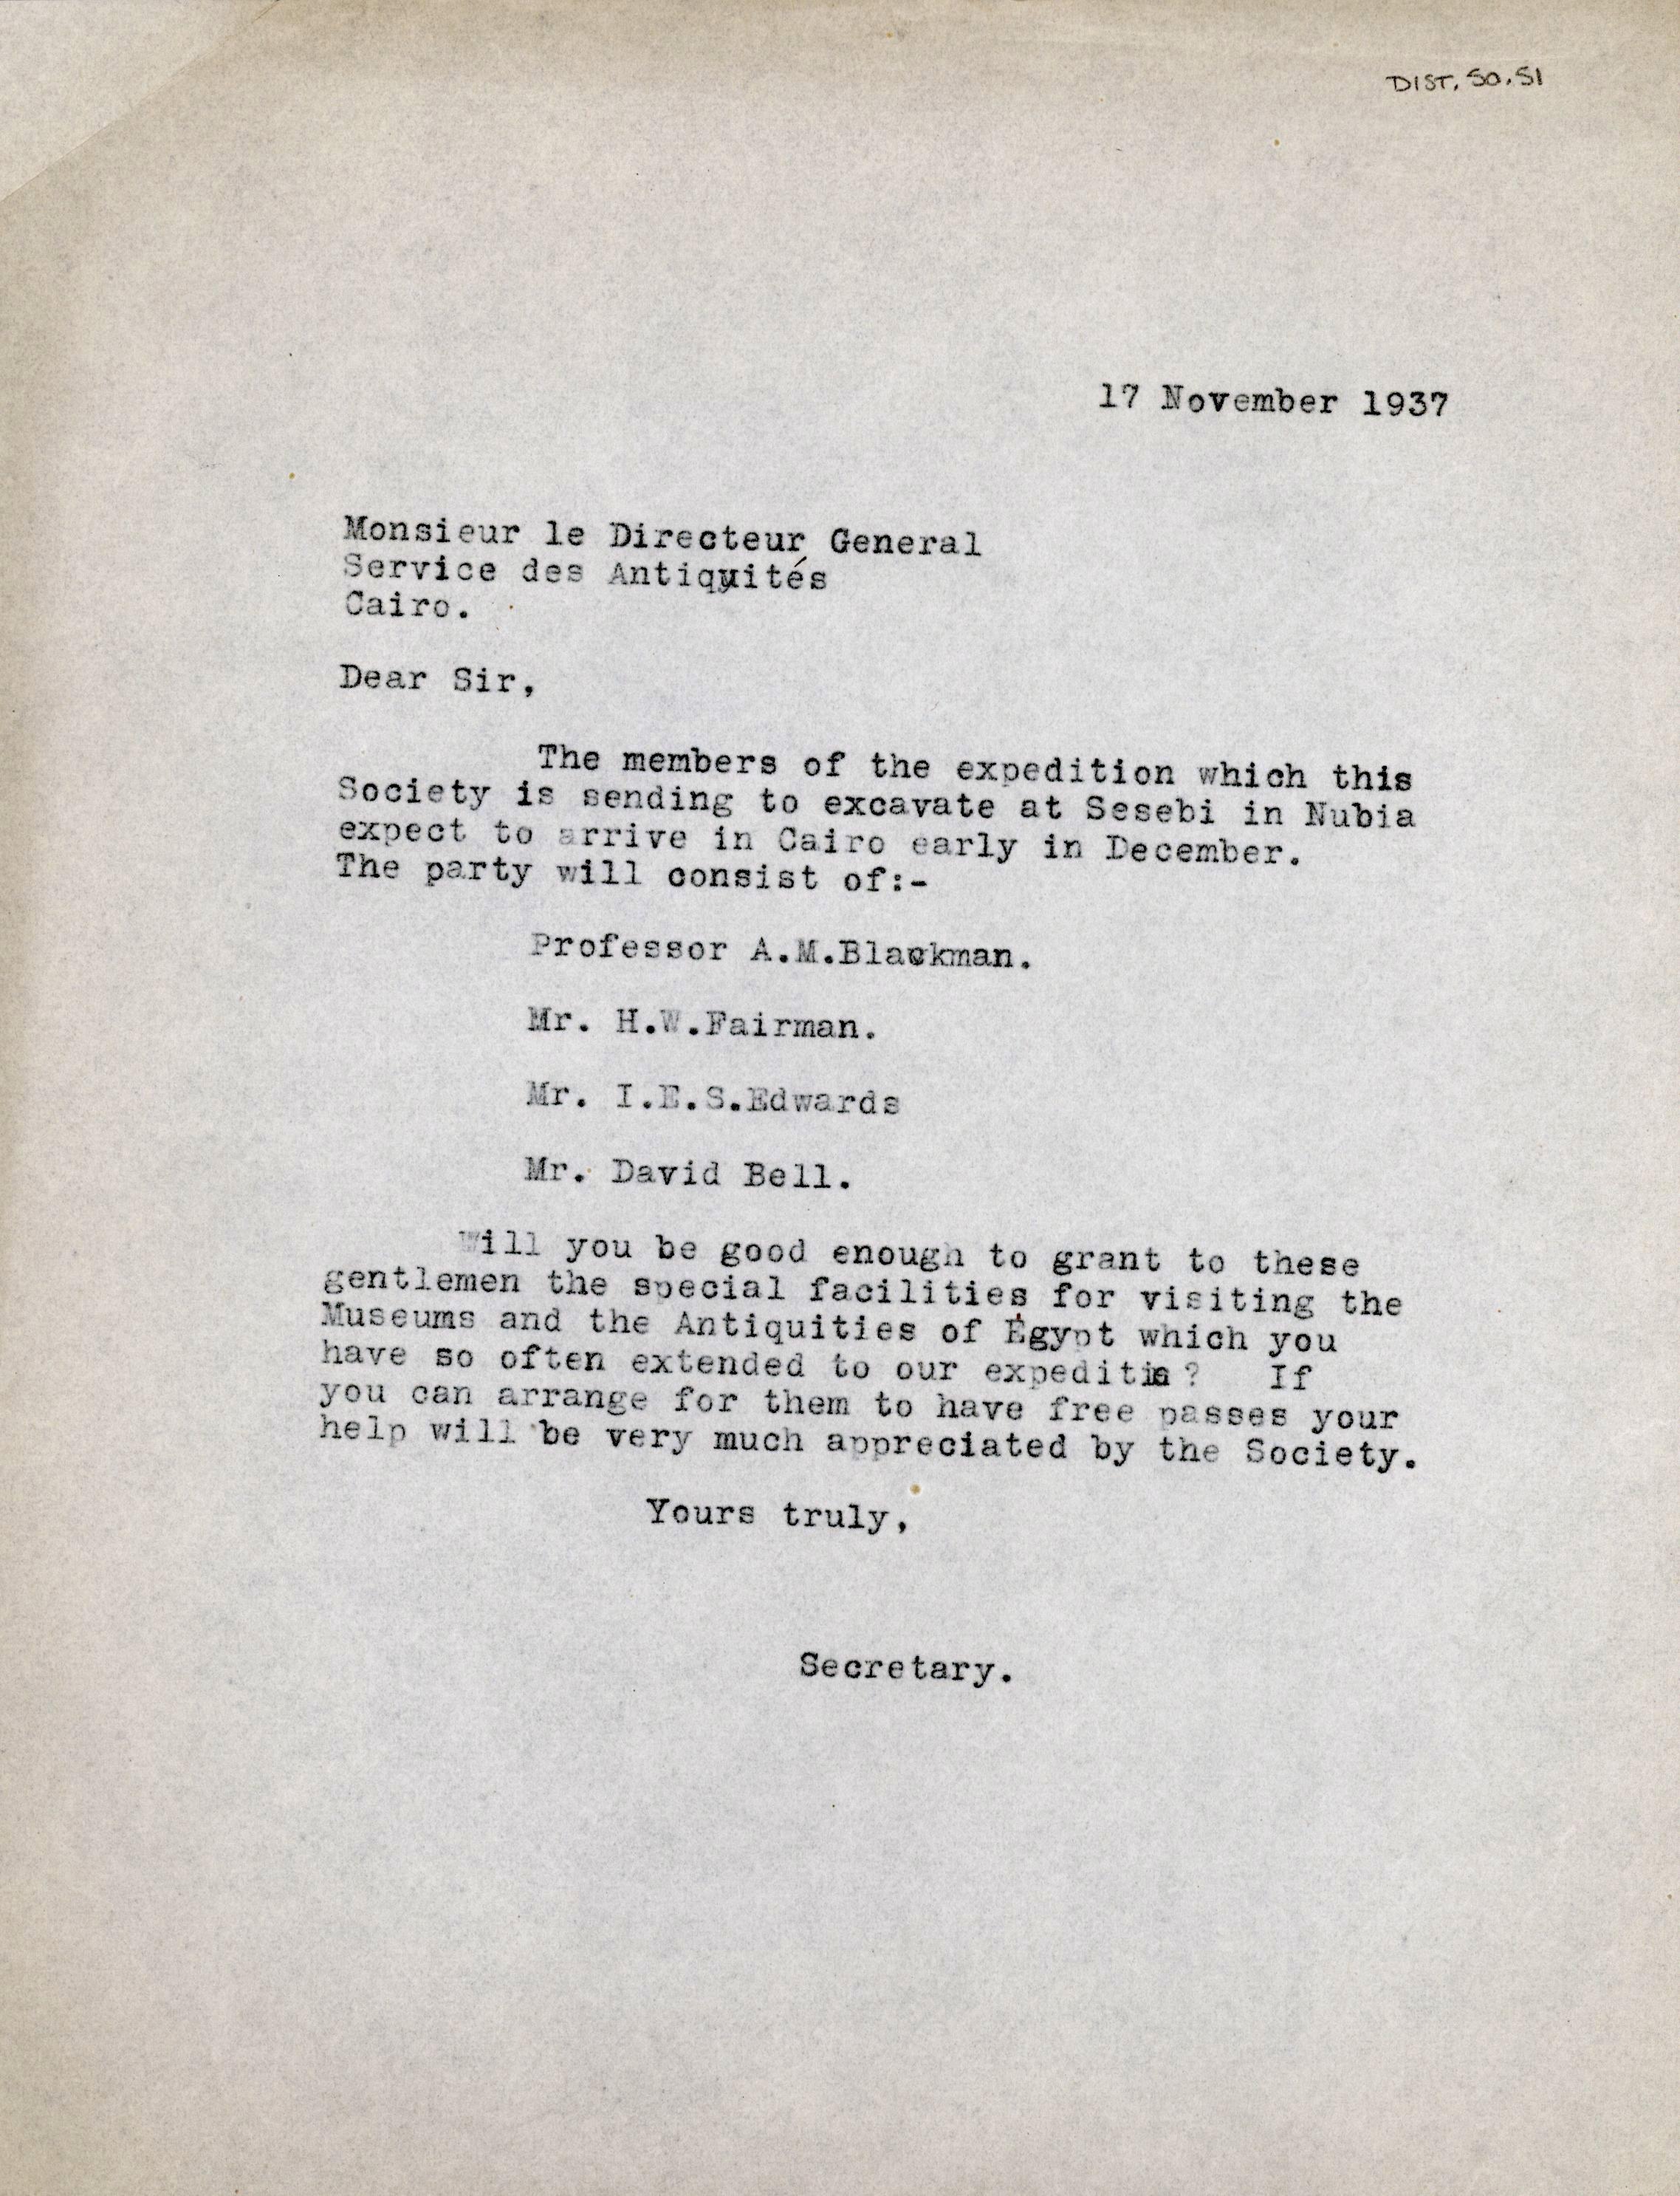 1926-39 correspondence with Antiquities Service DIST.50.51